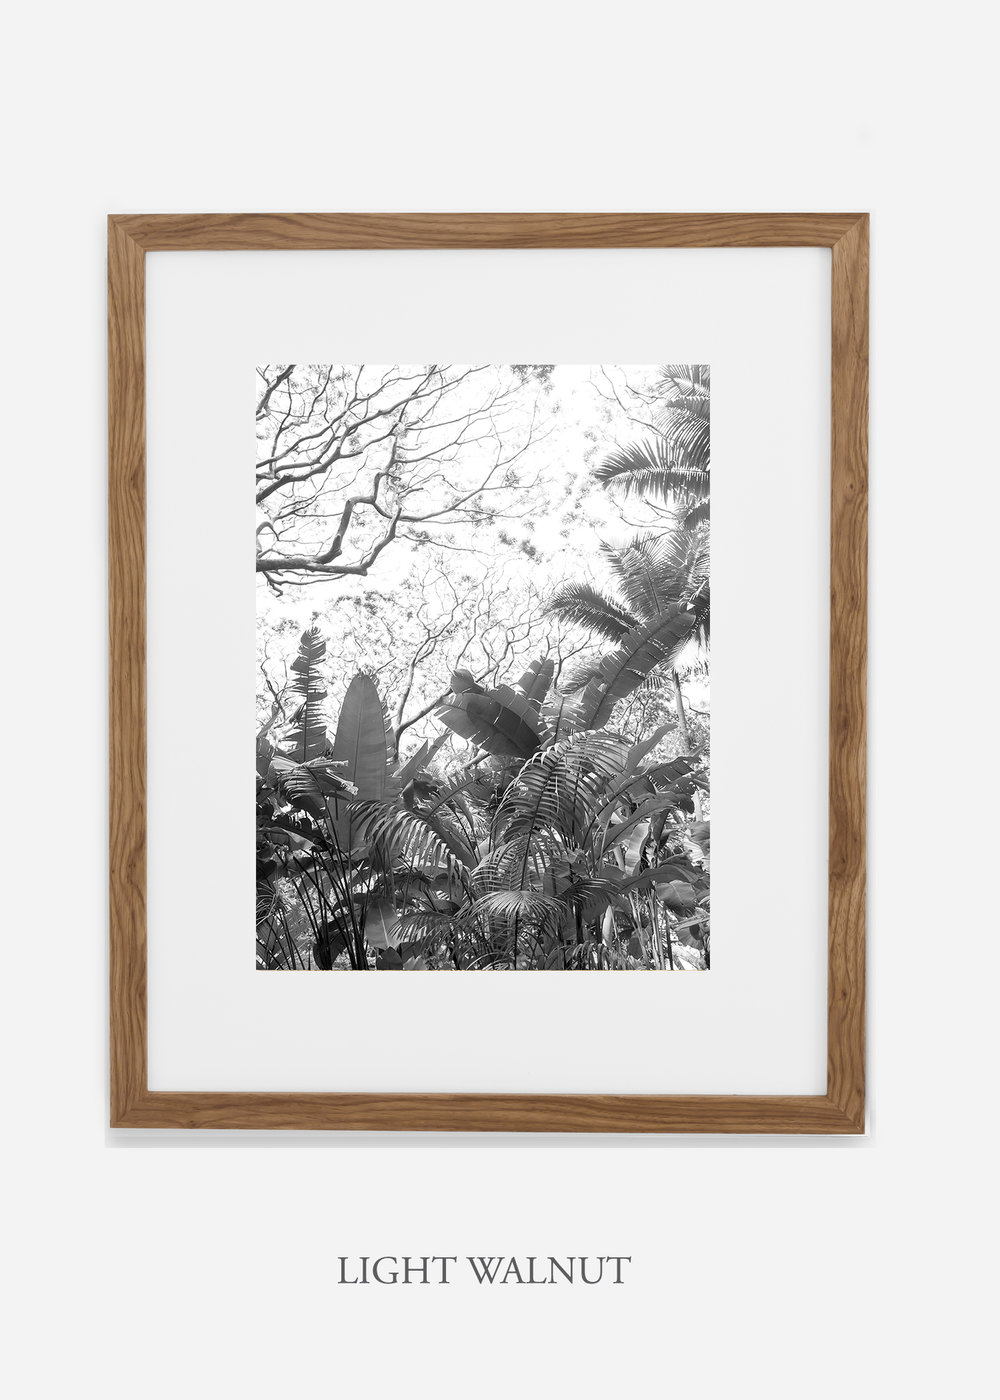 tropicaldecor_WilderCalifornia_TropicalRainforest2_Art_Photography_interiordesign_lightwalnutframe.jpg